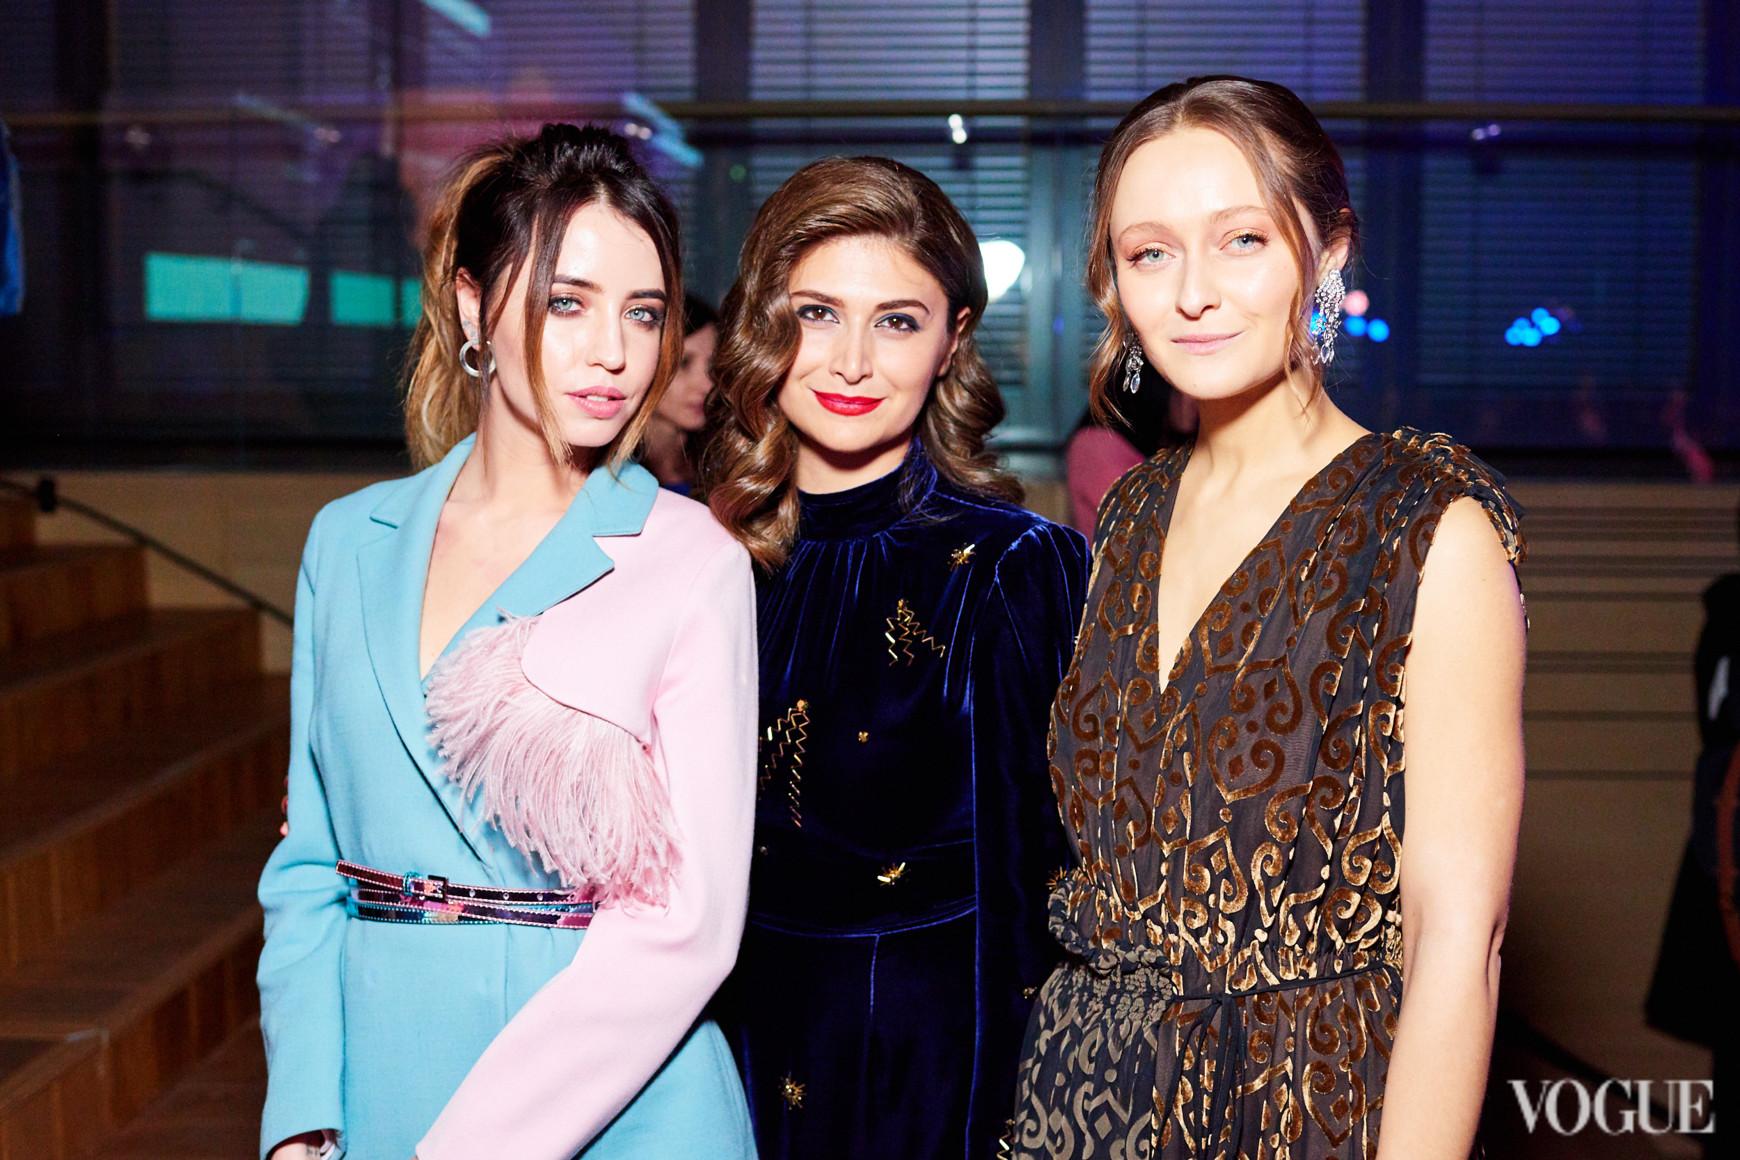 Надежда Дорофеева, Нина Васадзе и Дарья Шаповалова